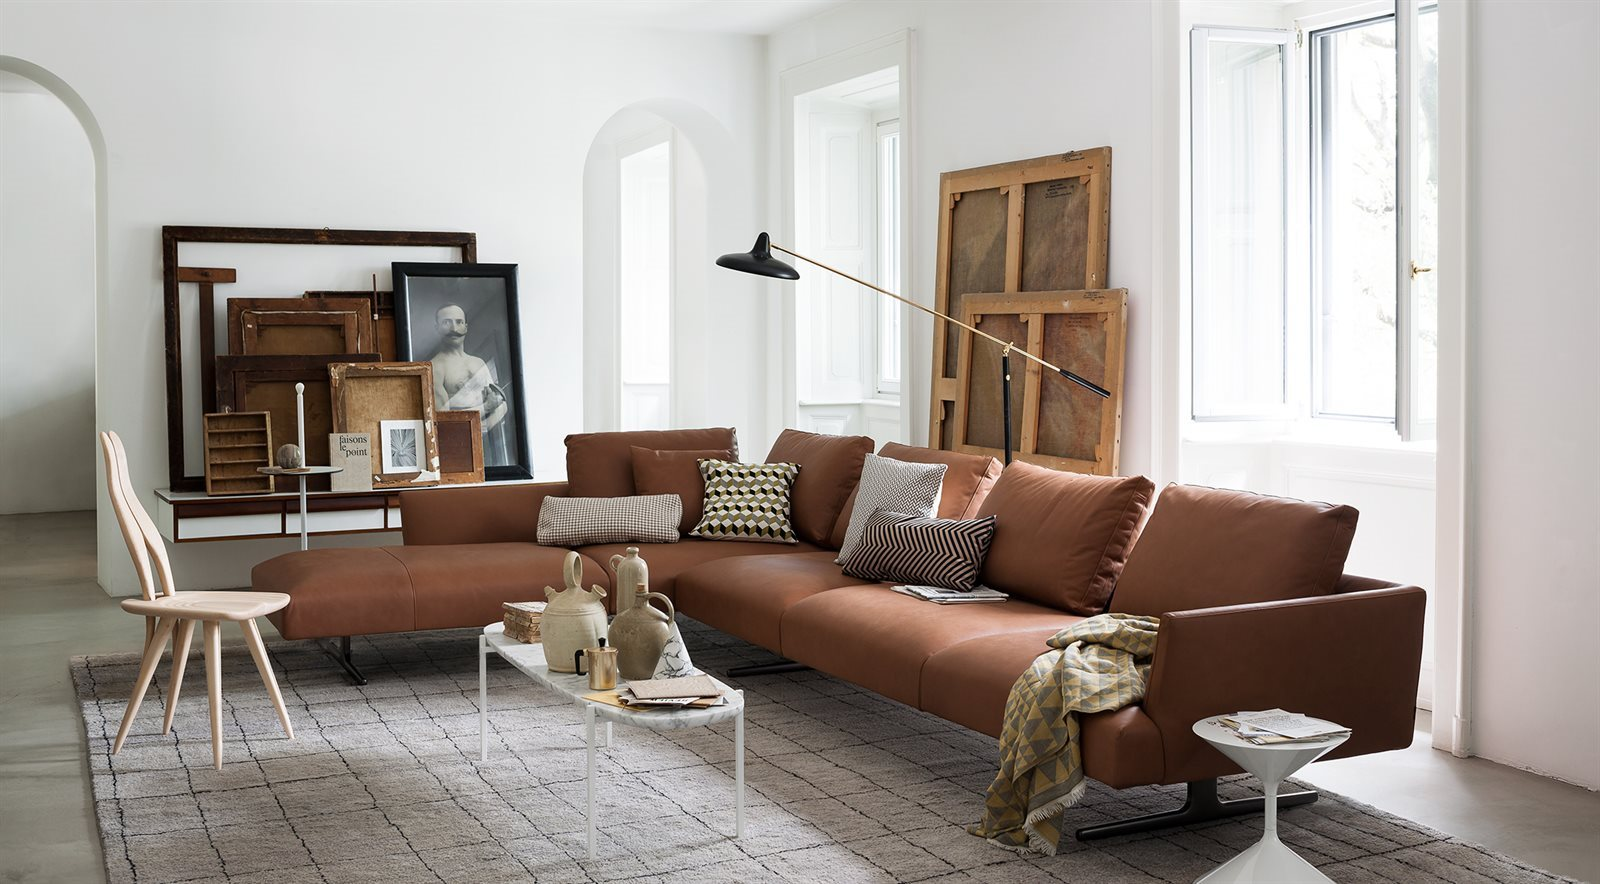 20chaplins-furniture_chaplins-hiro-sofa-by-zanotta.jpg